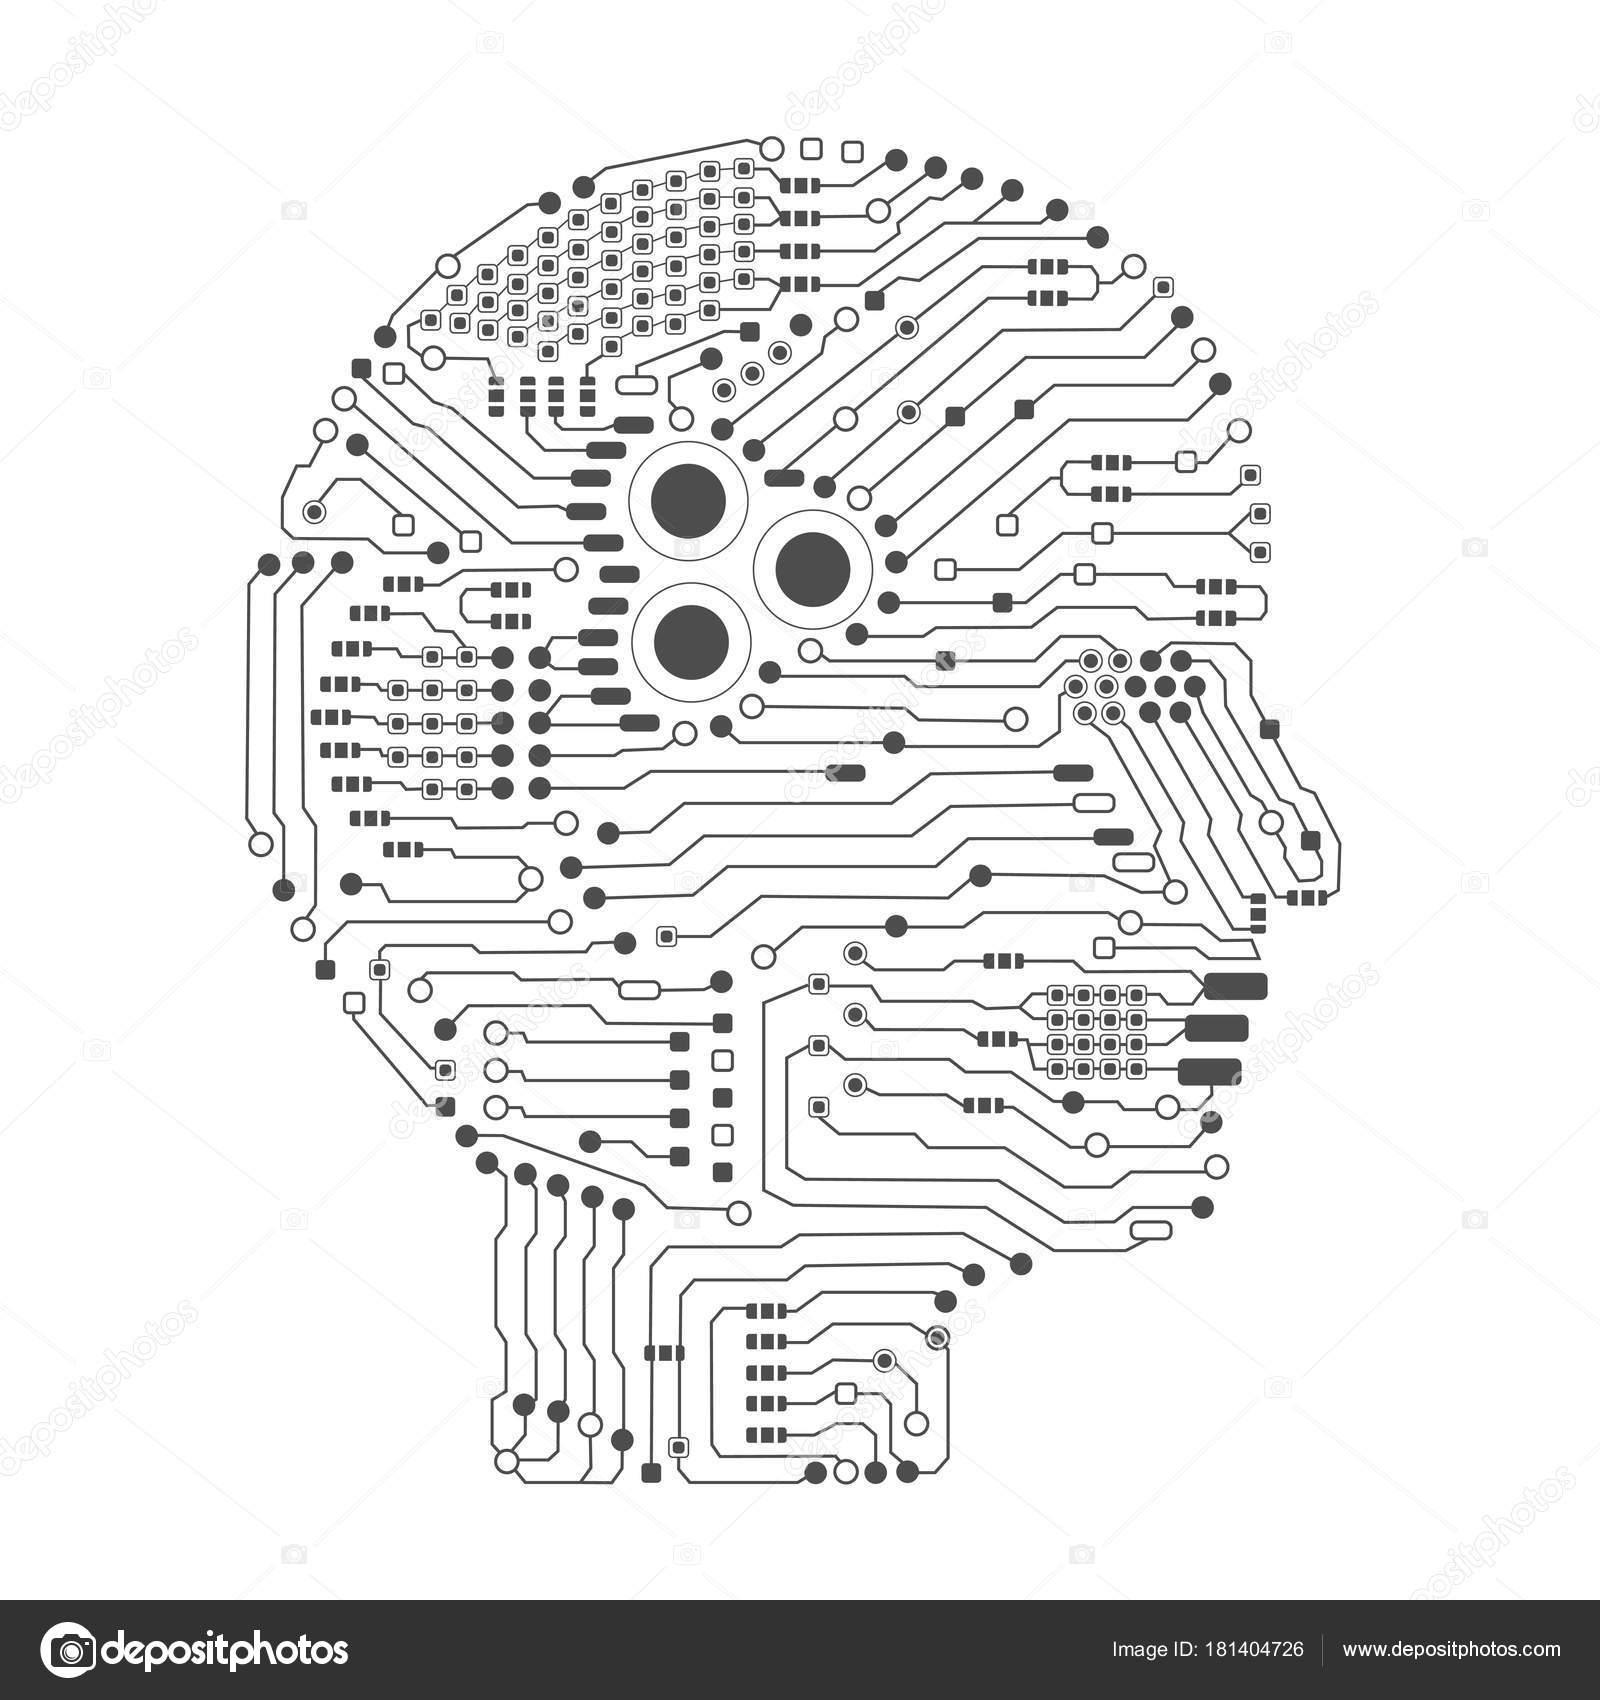 side vector circboard wiring diagram artificial intelligence brain circuit board head shape side view  artificial intelligence brain circuit